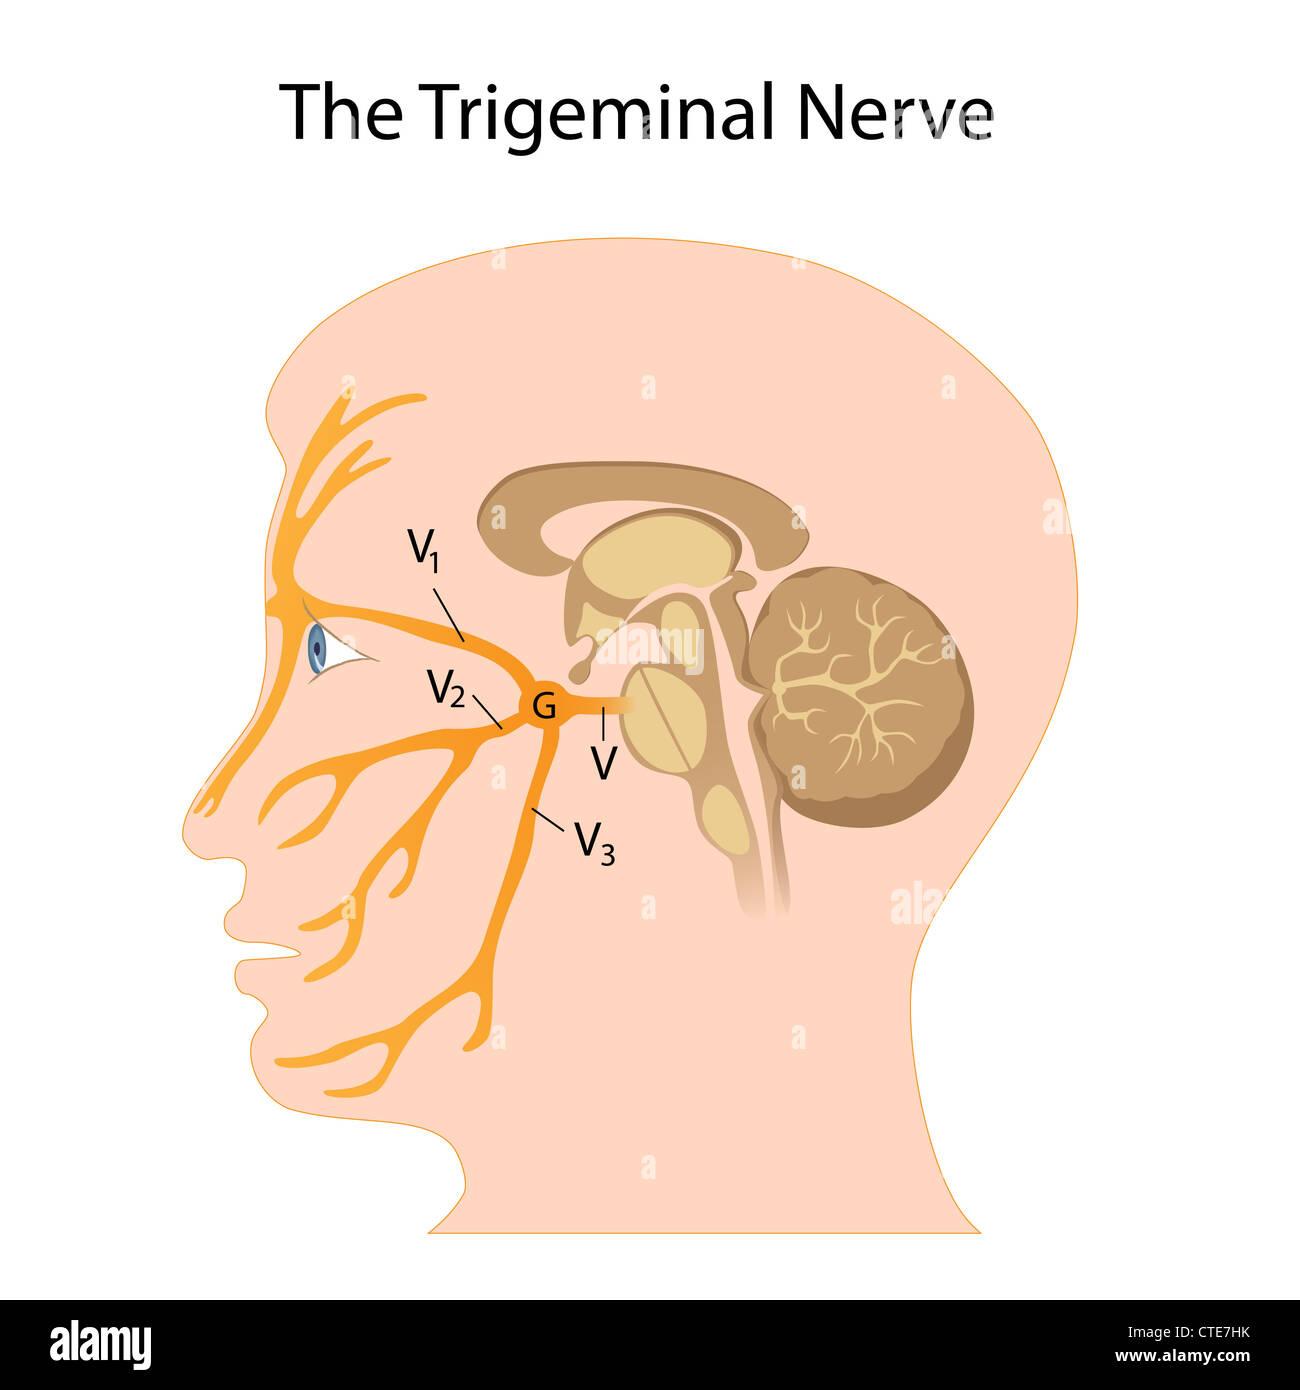 Nervus trigeminus Stockfoto, Bild: 49485791 - Alamy